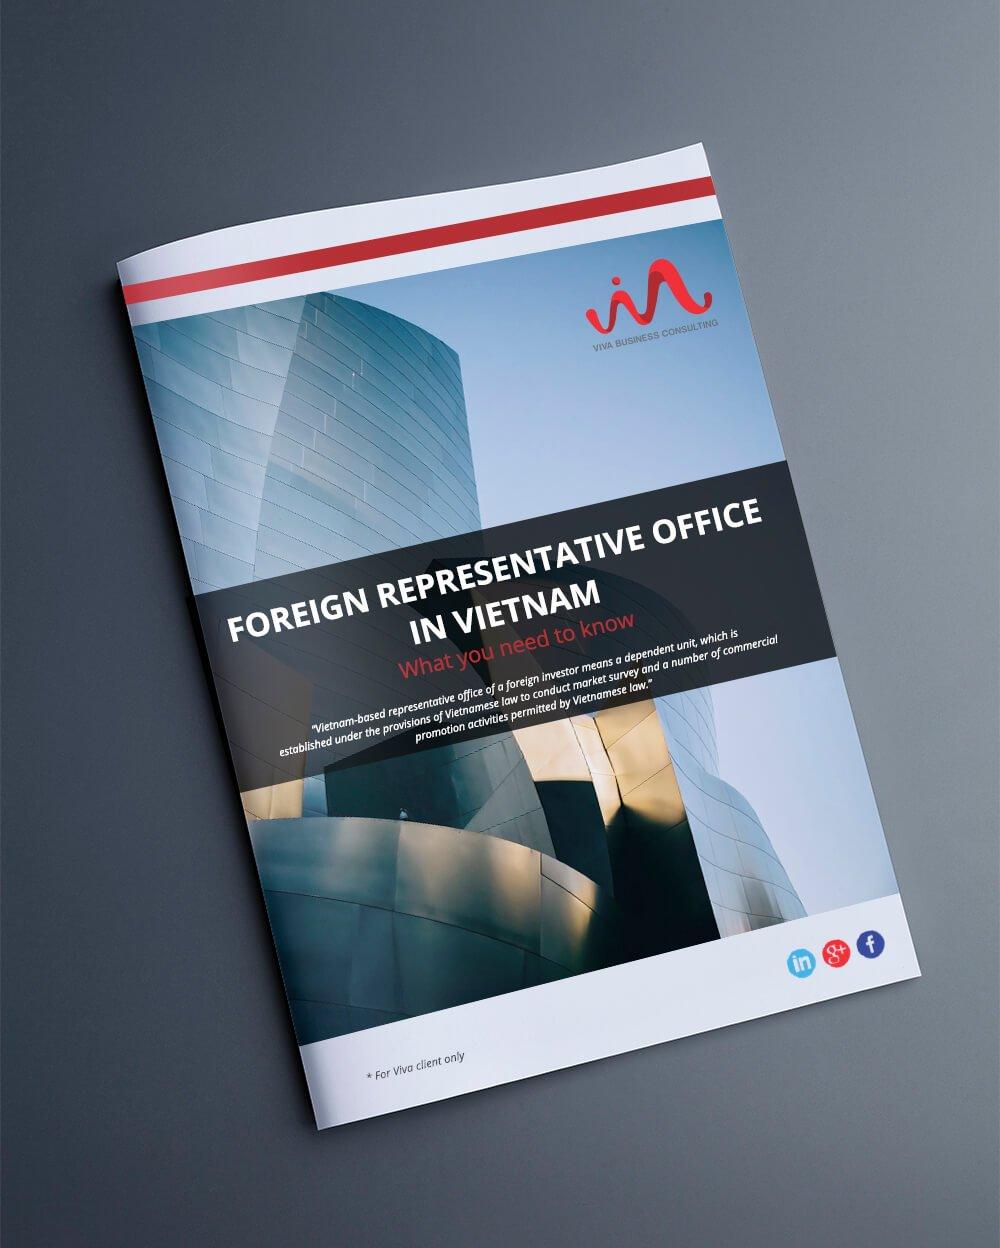 Foreign representative office 2019 in Vietnam handbook